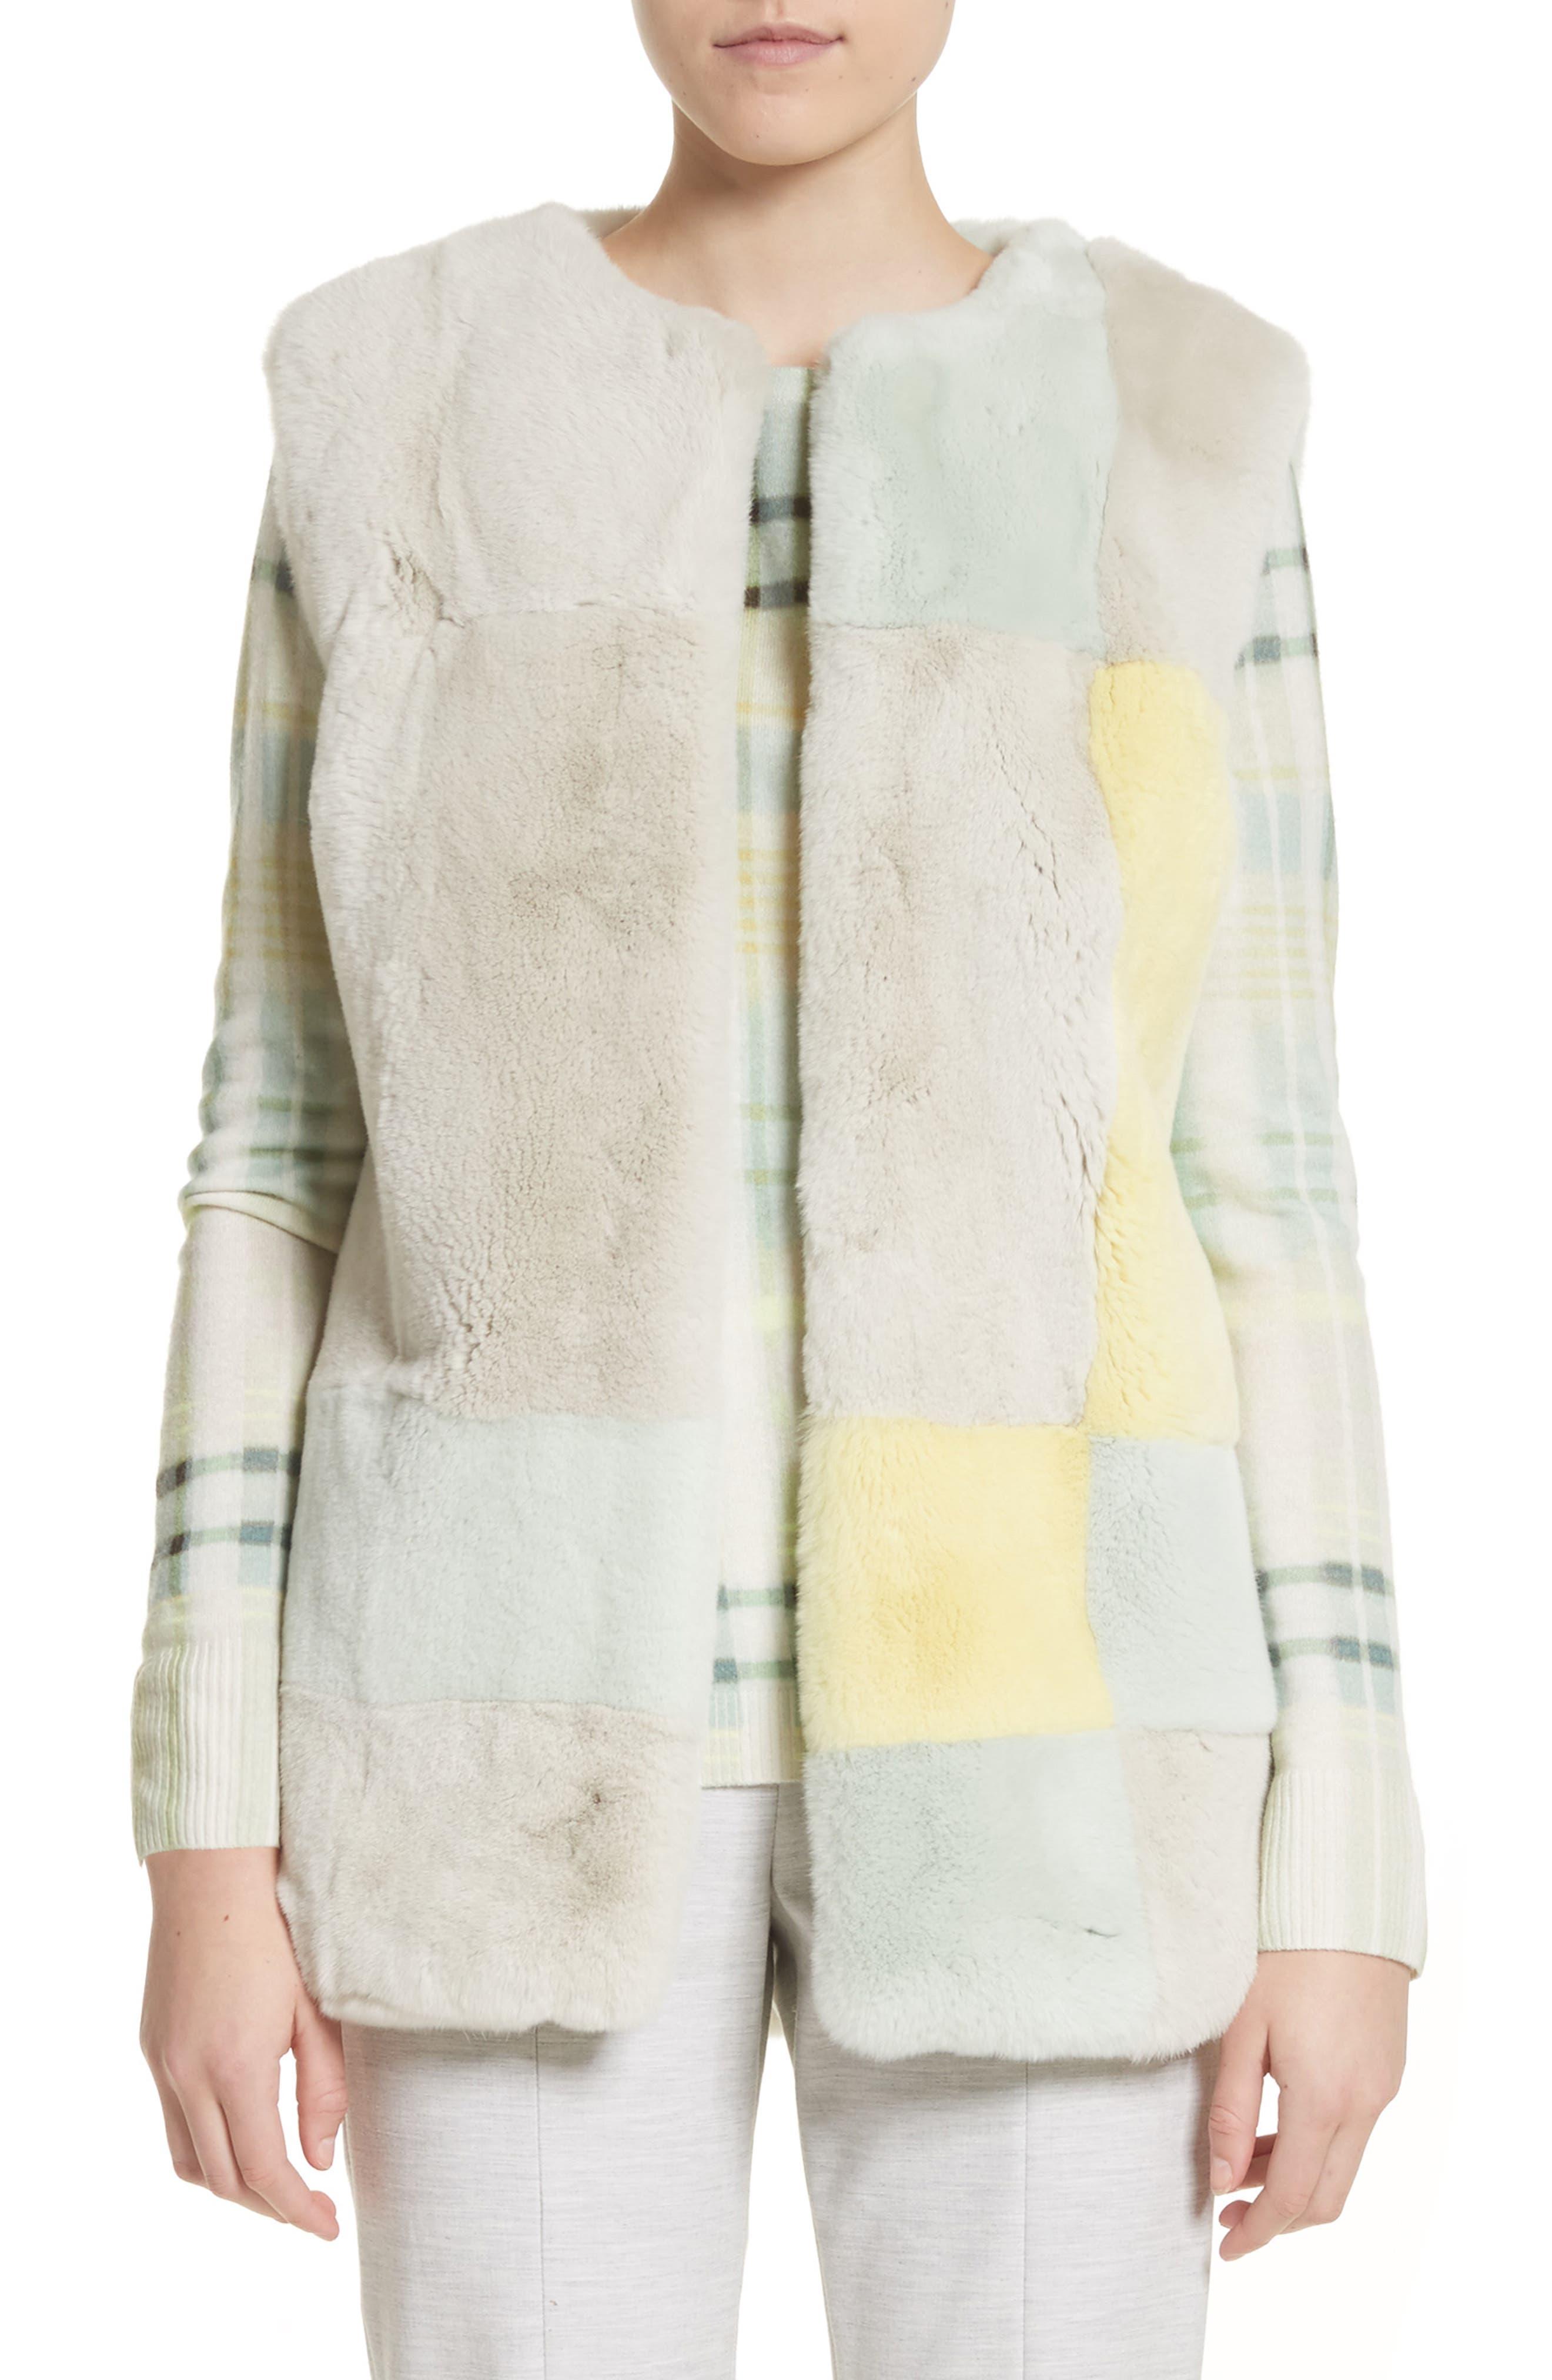 Alternate Image 1 Selected - St. John Collection Genuine Rabbit Fur Intarsia Vest